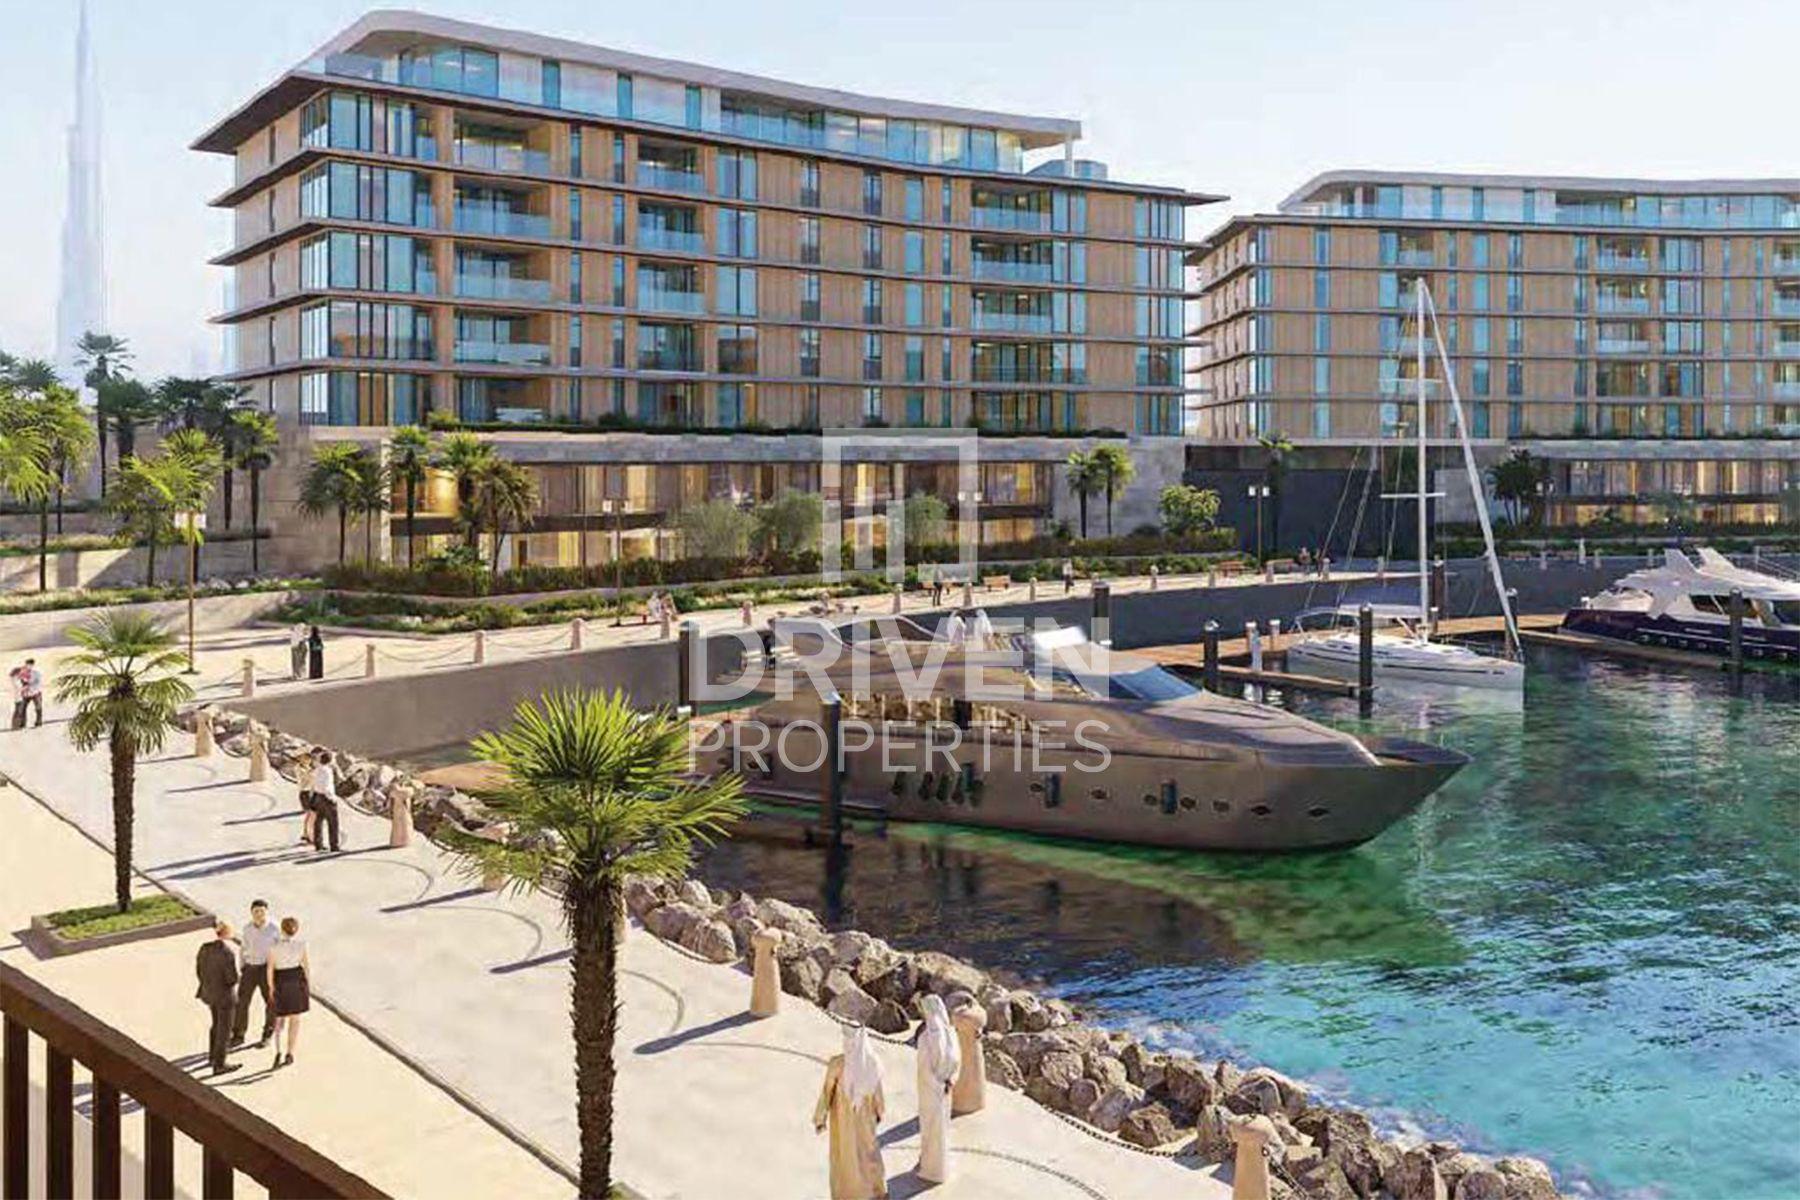 Luxurious Duplex in Bulgari Marina Lofts